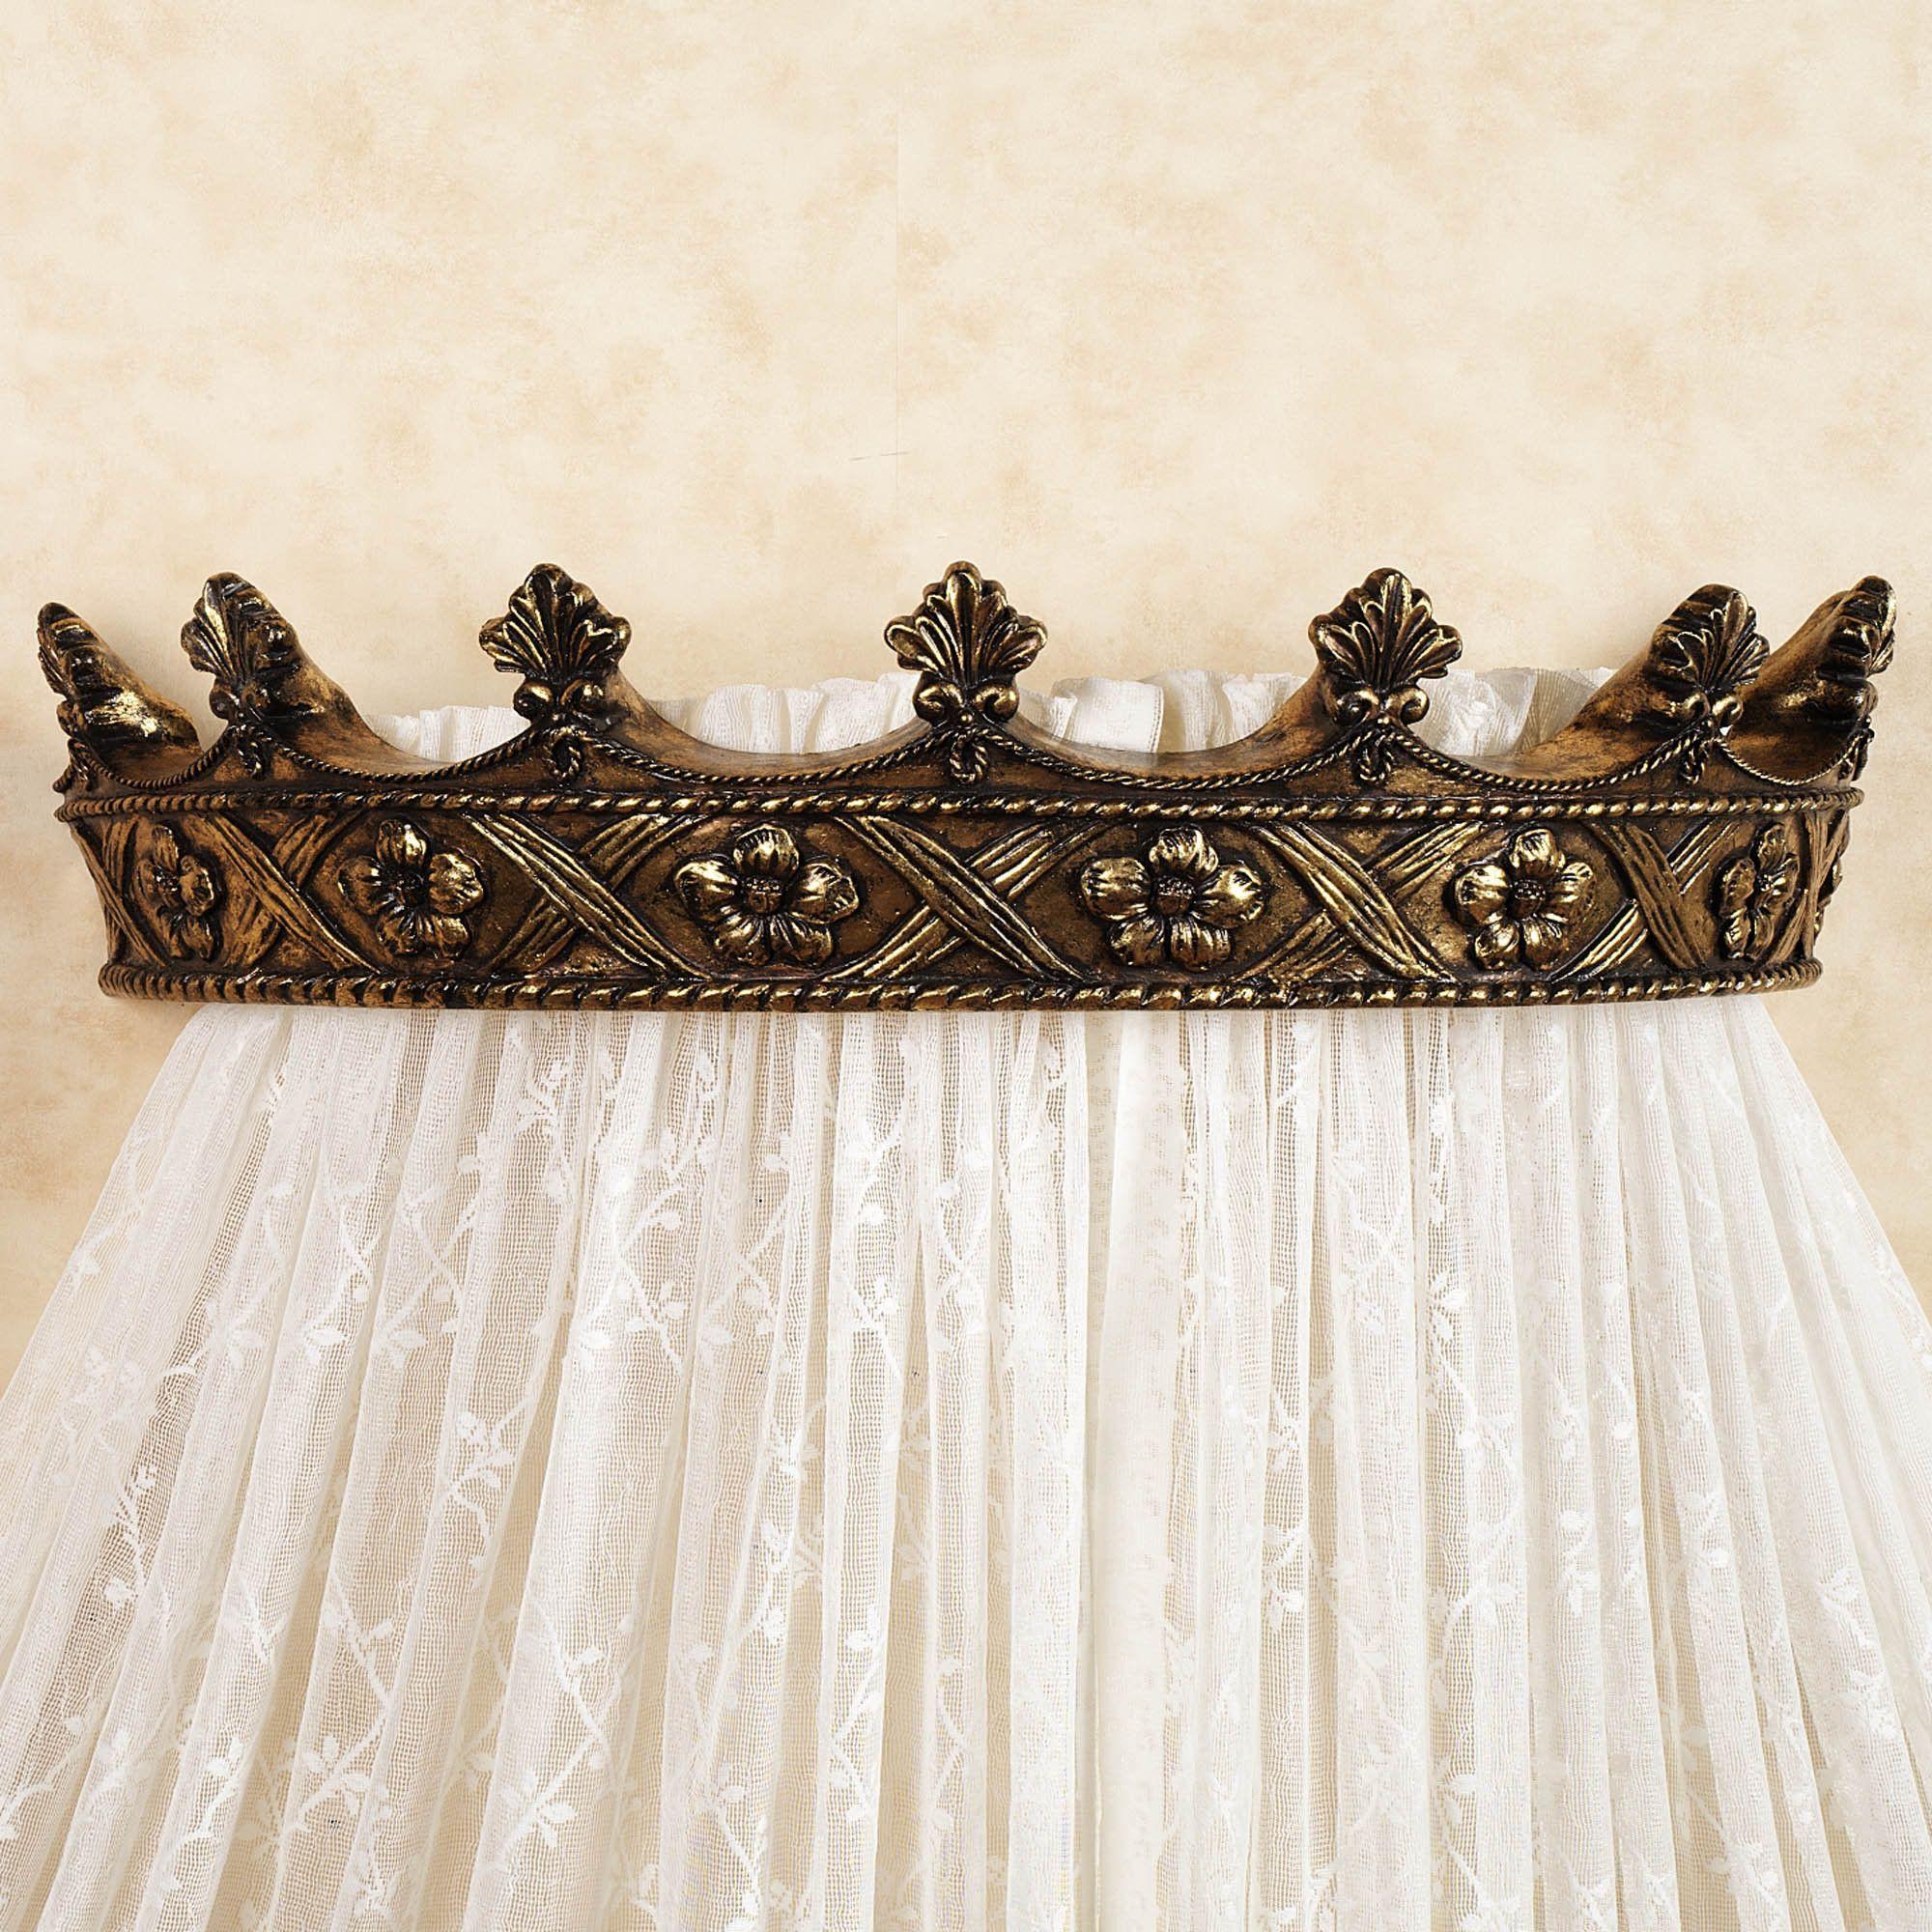 Noble Crown Wall Teester Bed Crown | Bed crown, Bed crown ... on Wall Teester Bed Crown  id=40694